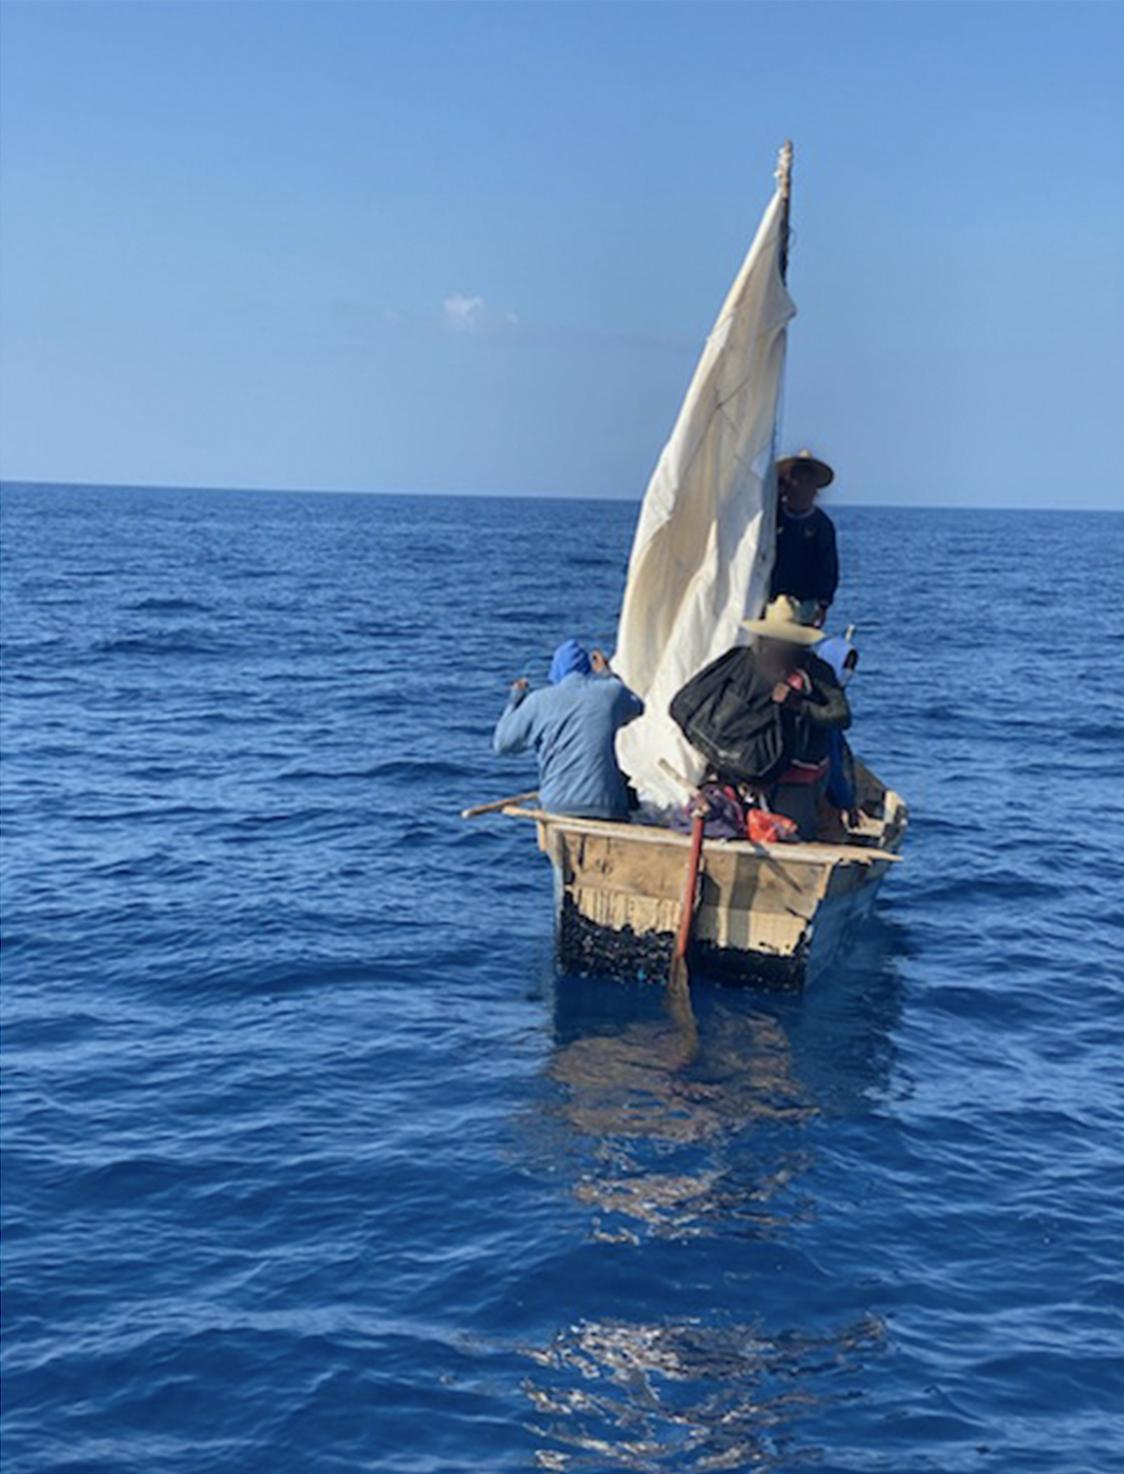 Coast Guardrepatriates8 people after interdiction off the Florida Keys